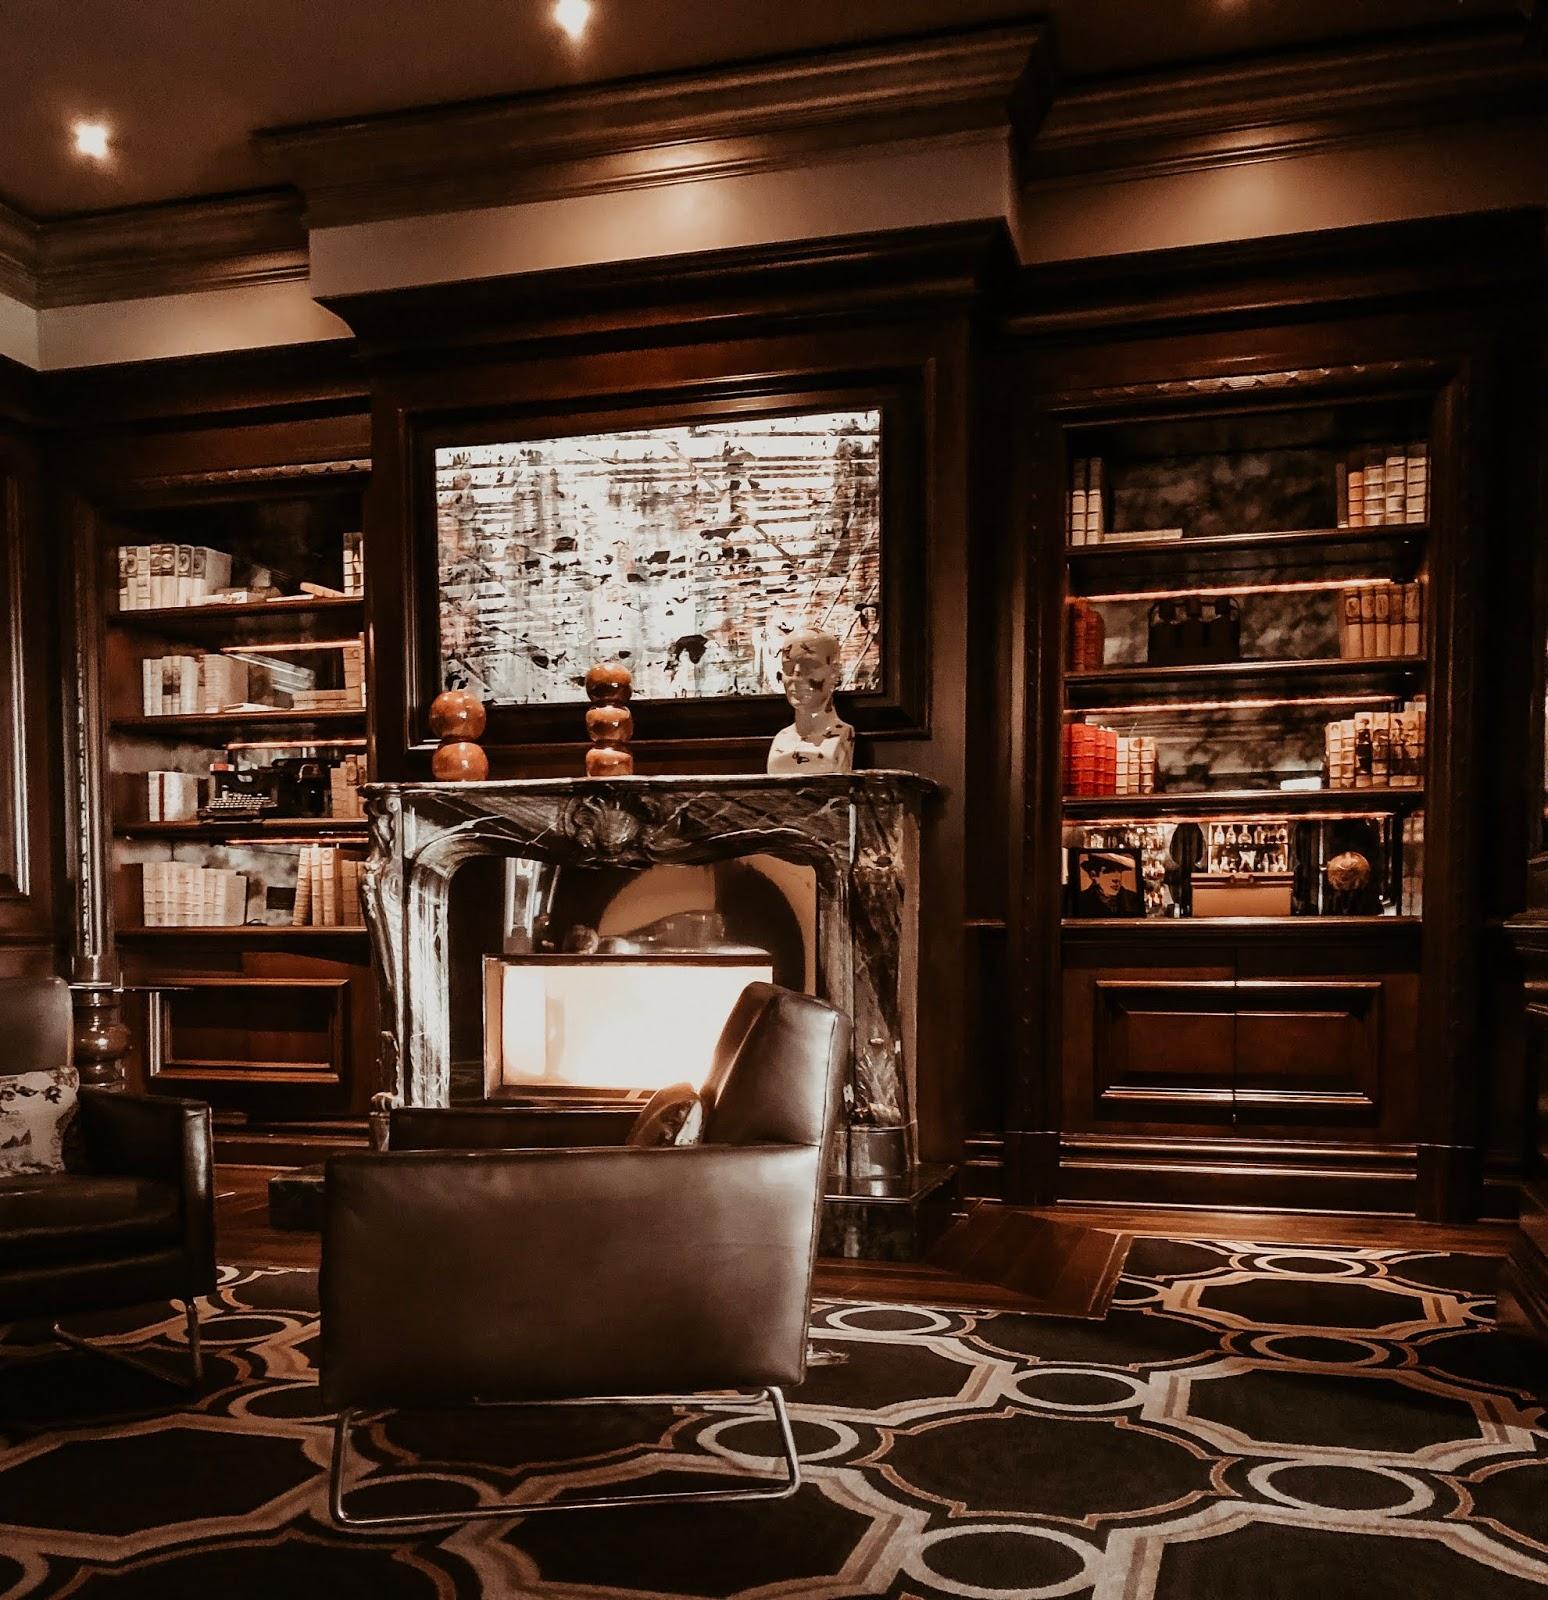 the-most-memorable-end-of-summer2019-getaway-at-the-langham-huntington-hotel-pasadena-california-lounge-bar